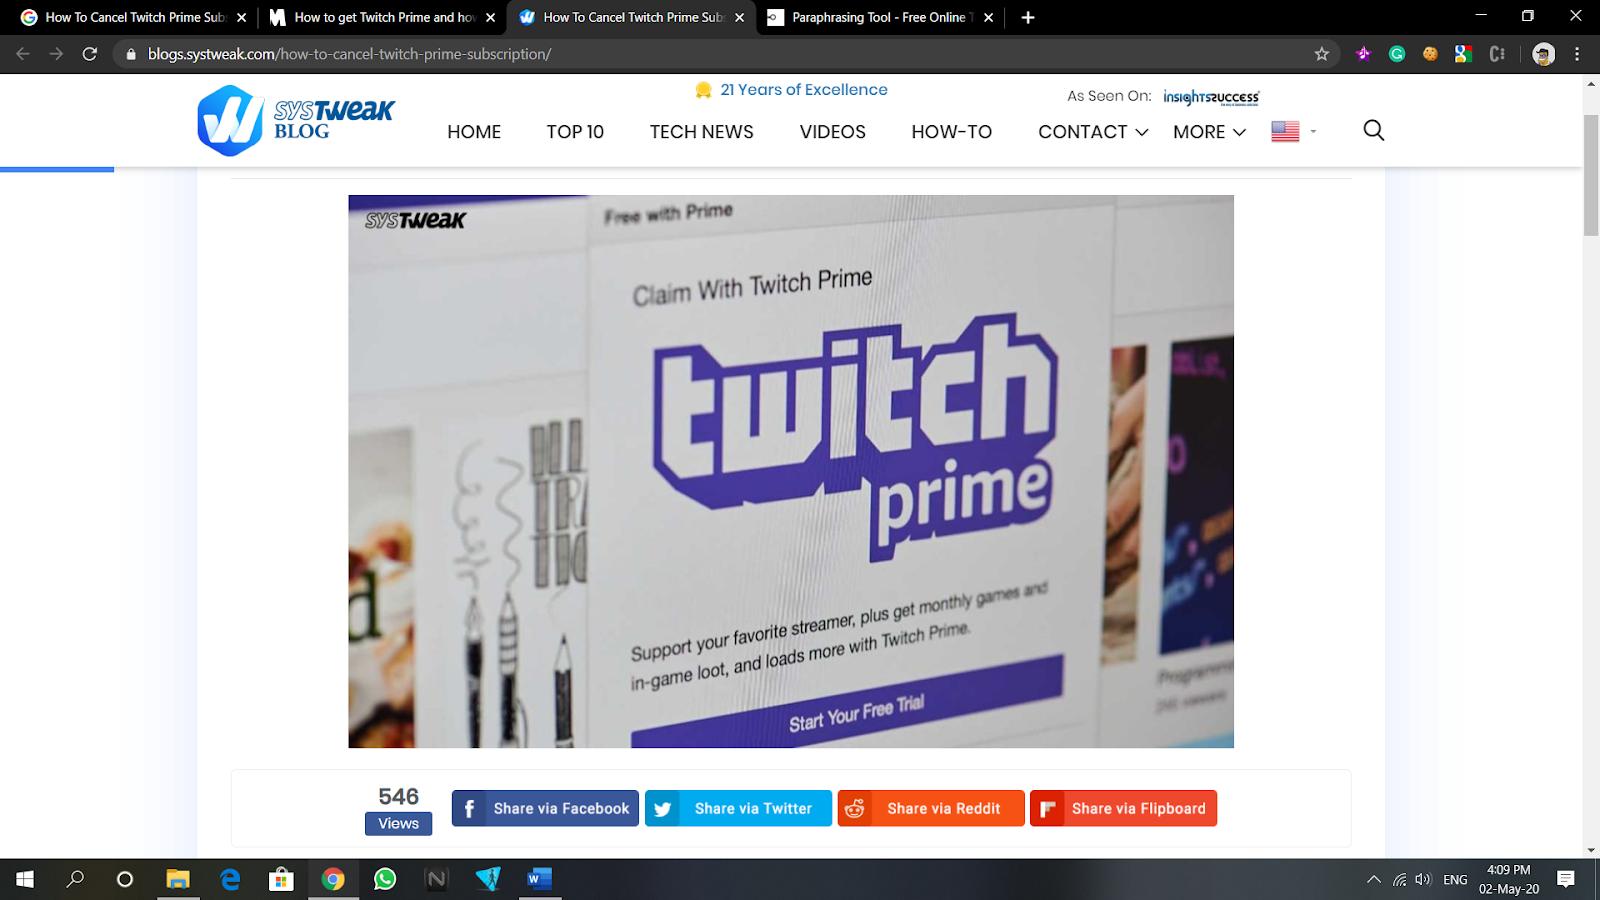 cancel twitch prime subscription